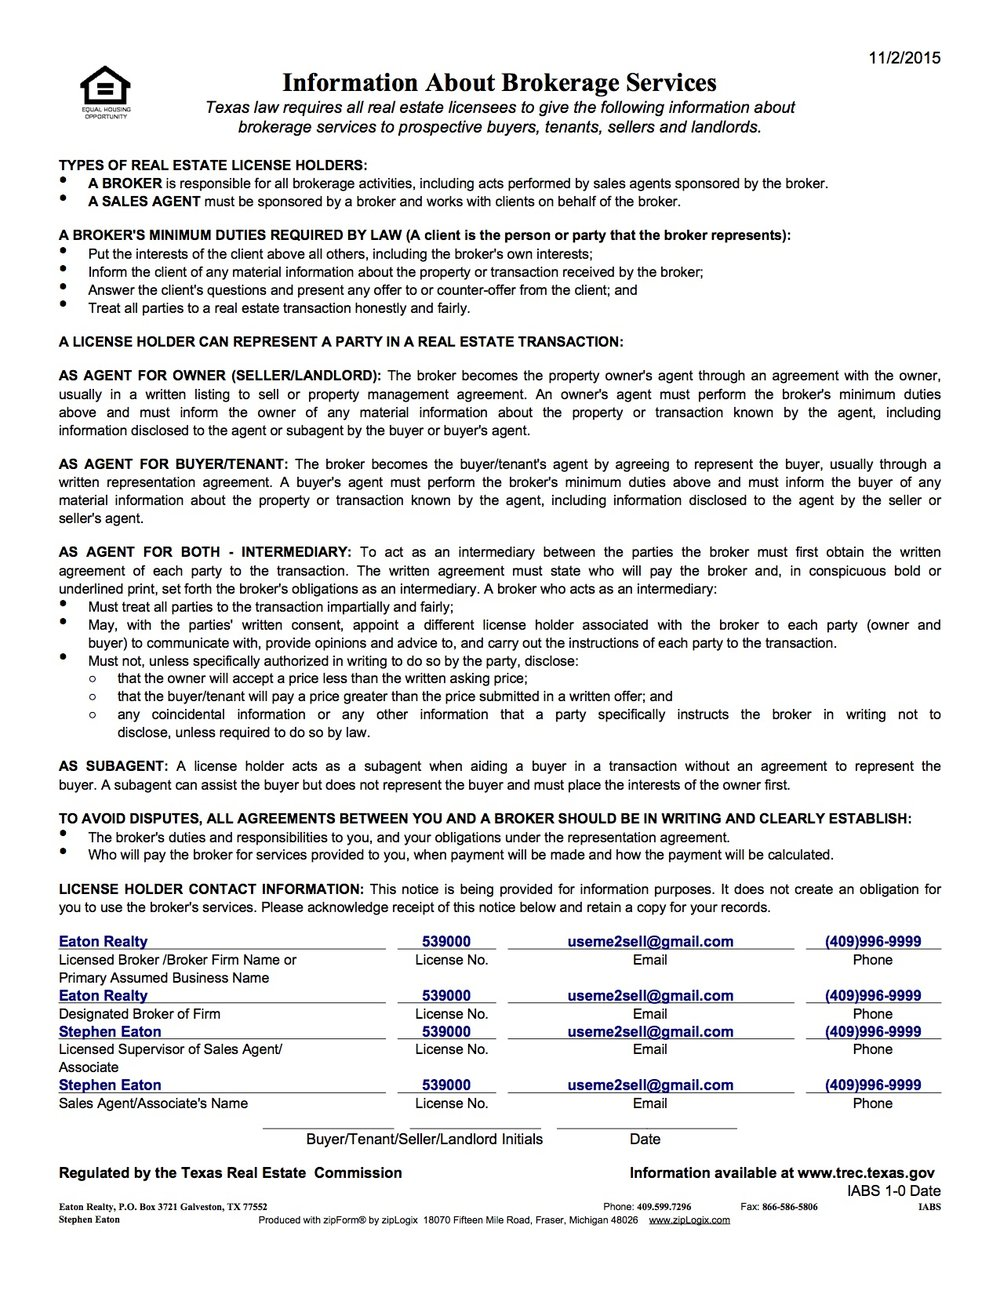 Information_About_Brokerage_Services_BuyerTenant_-_11215_ts55409.jpg